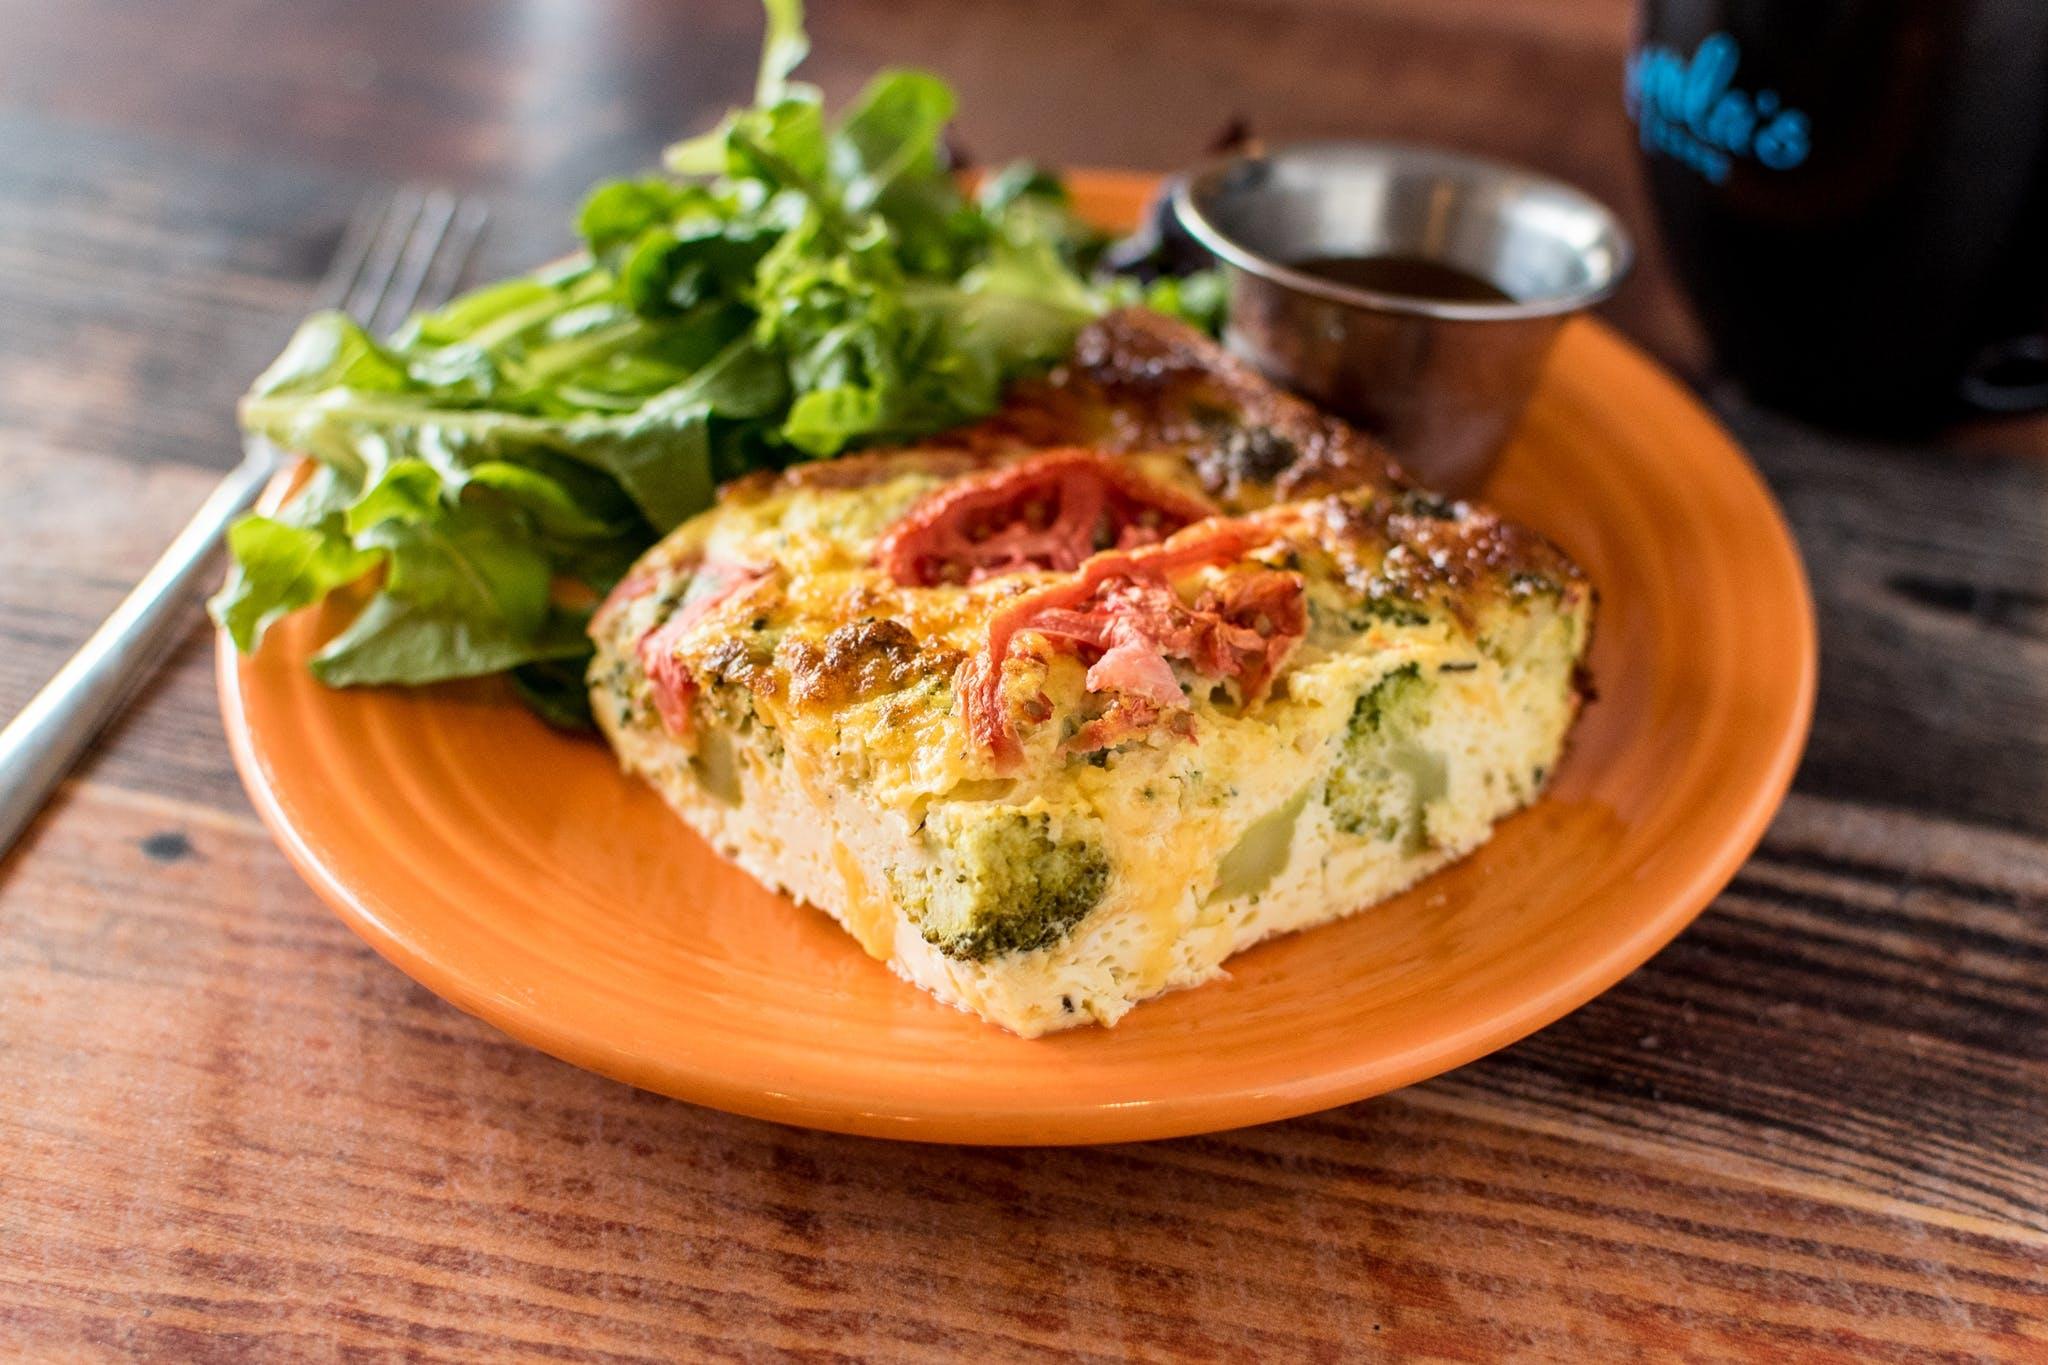 Veggie Frittata (Veg) (GF) from Yola's Cafe in Madison, WI